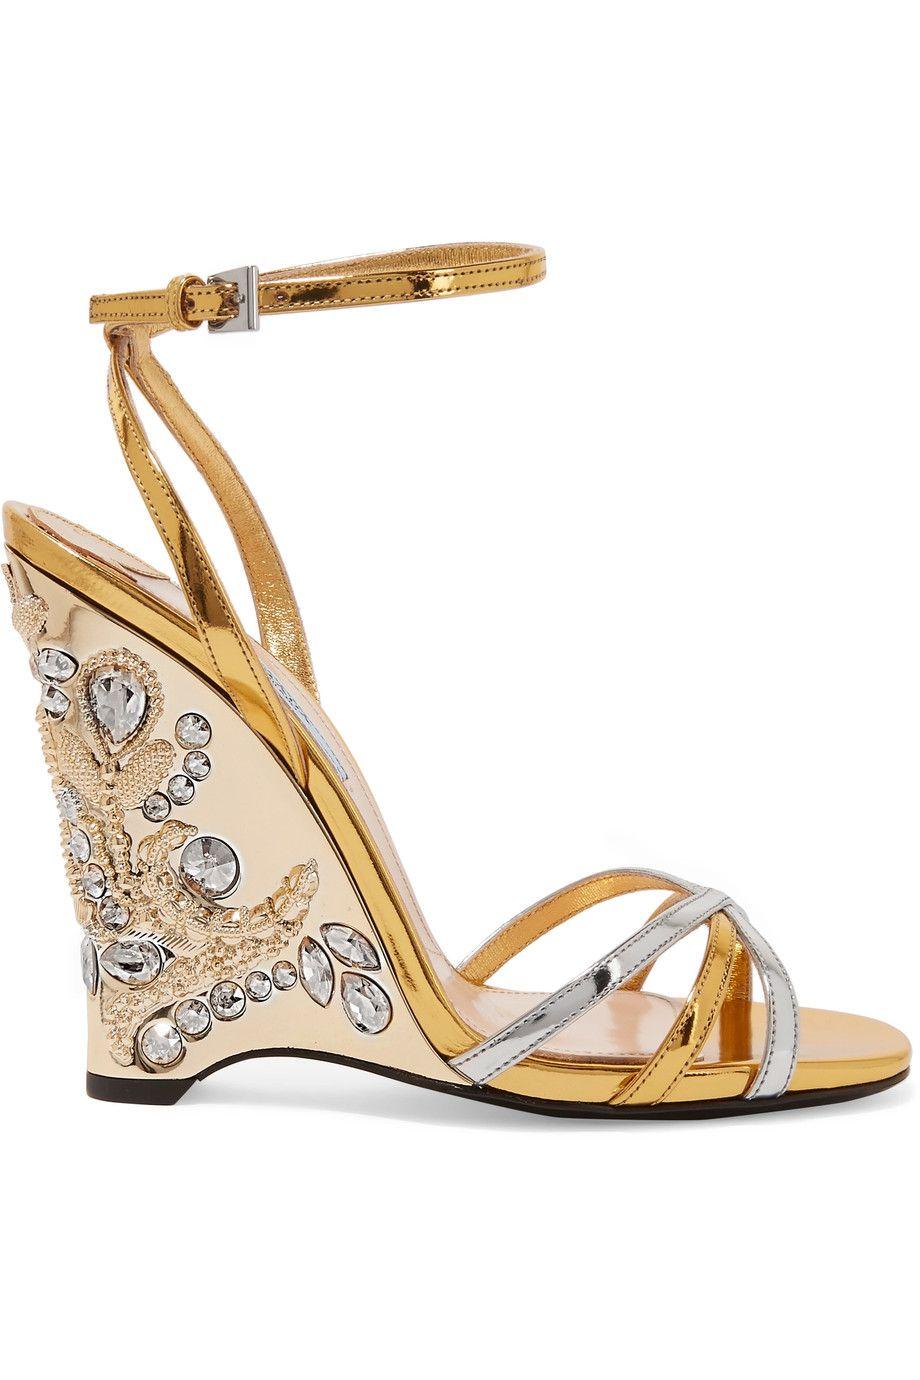 Prada | Embellished metallic leather wedge sandals | NET-A-PORTER.COM